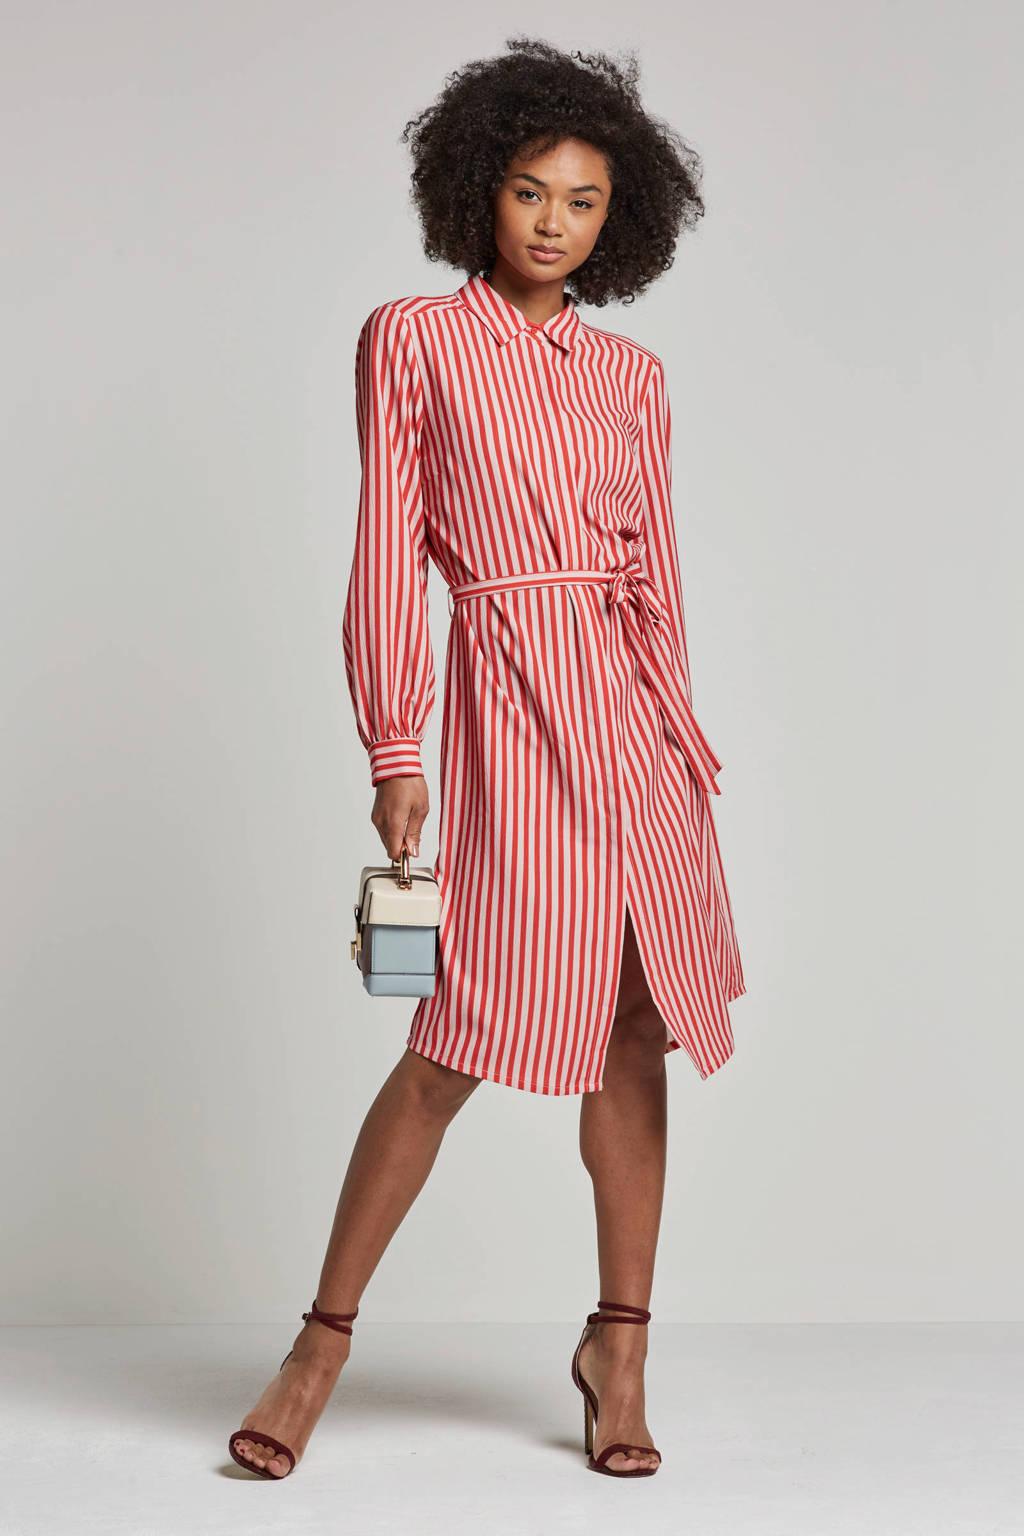 Saint Tropez jurk met streepdessin, Rood/roze